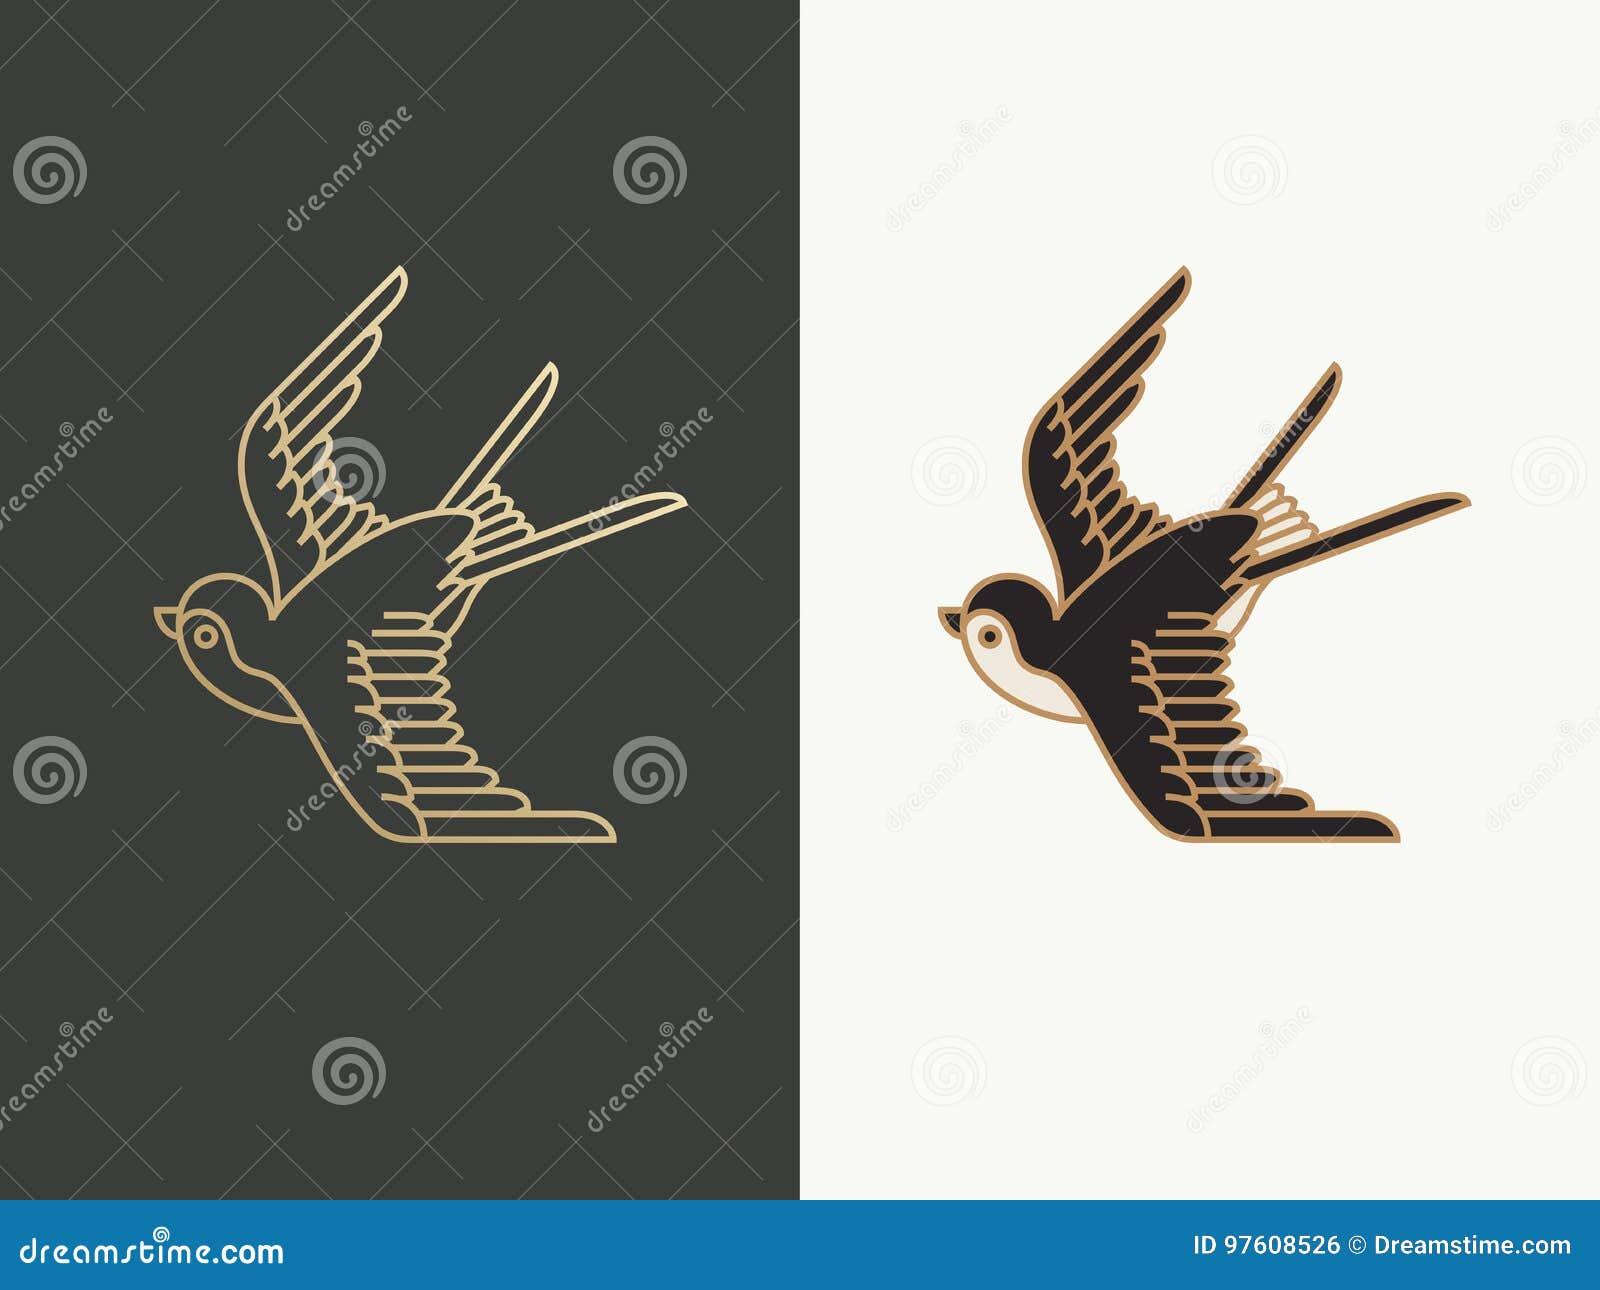 swallow bird logo stock illustration illustration of colored 97608526 https www dreamstime com stock illustration swallow bird logo design template illustration image97608526